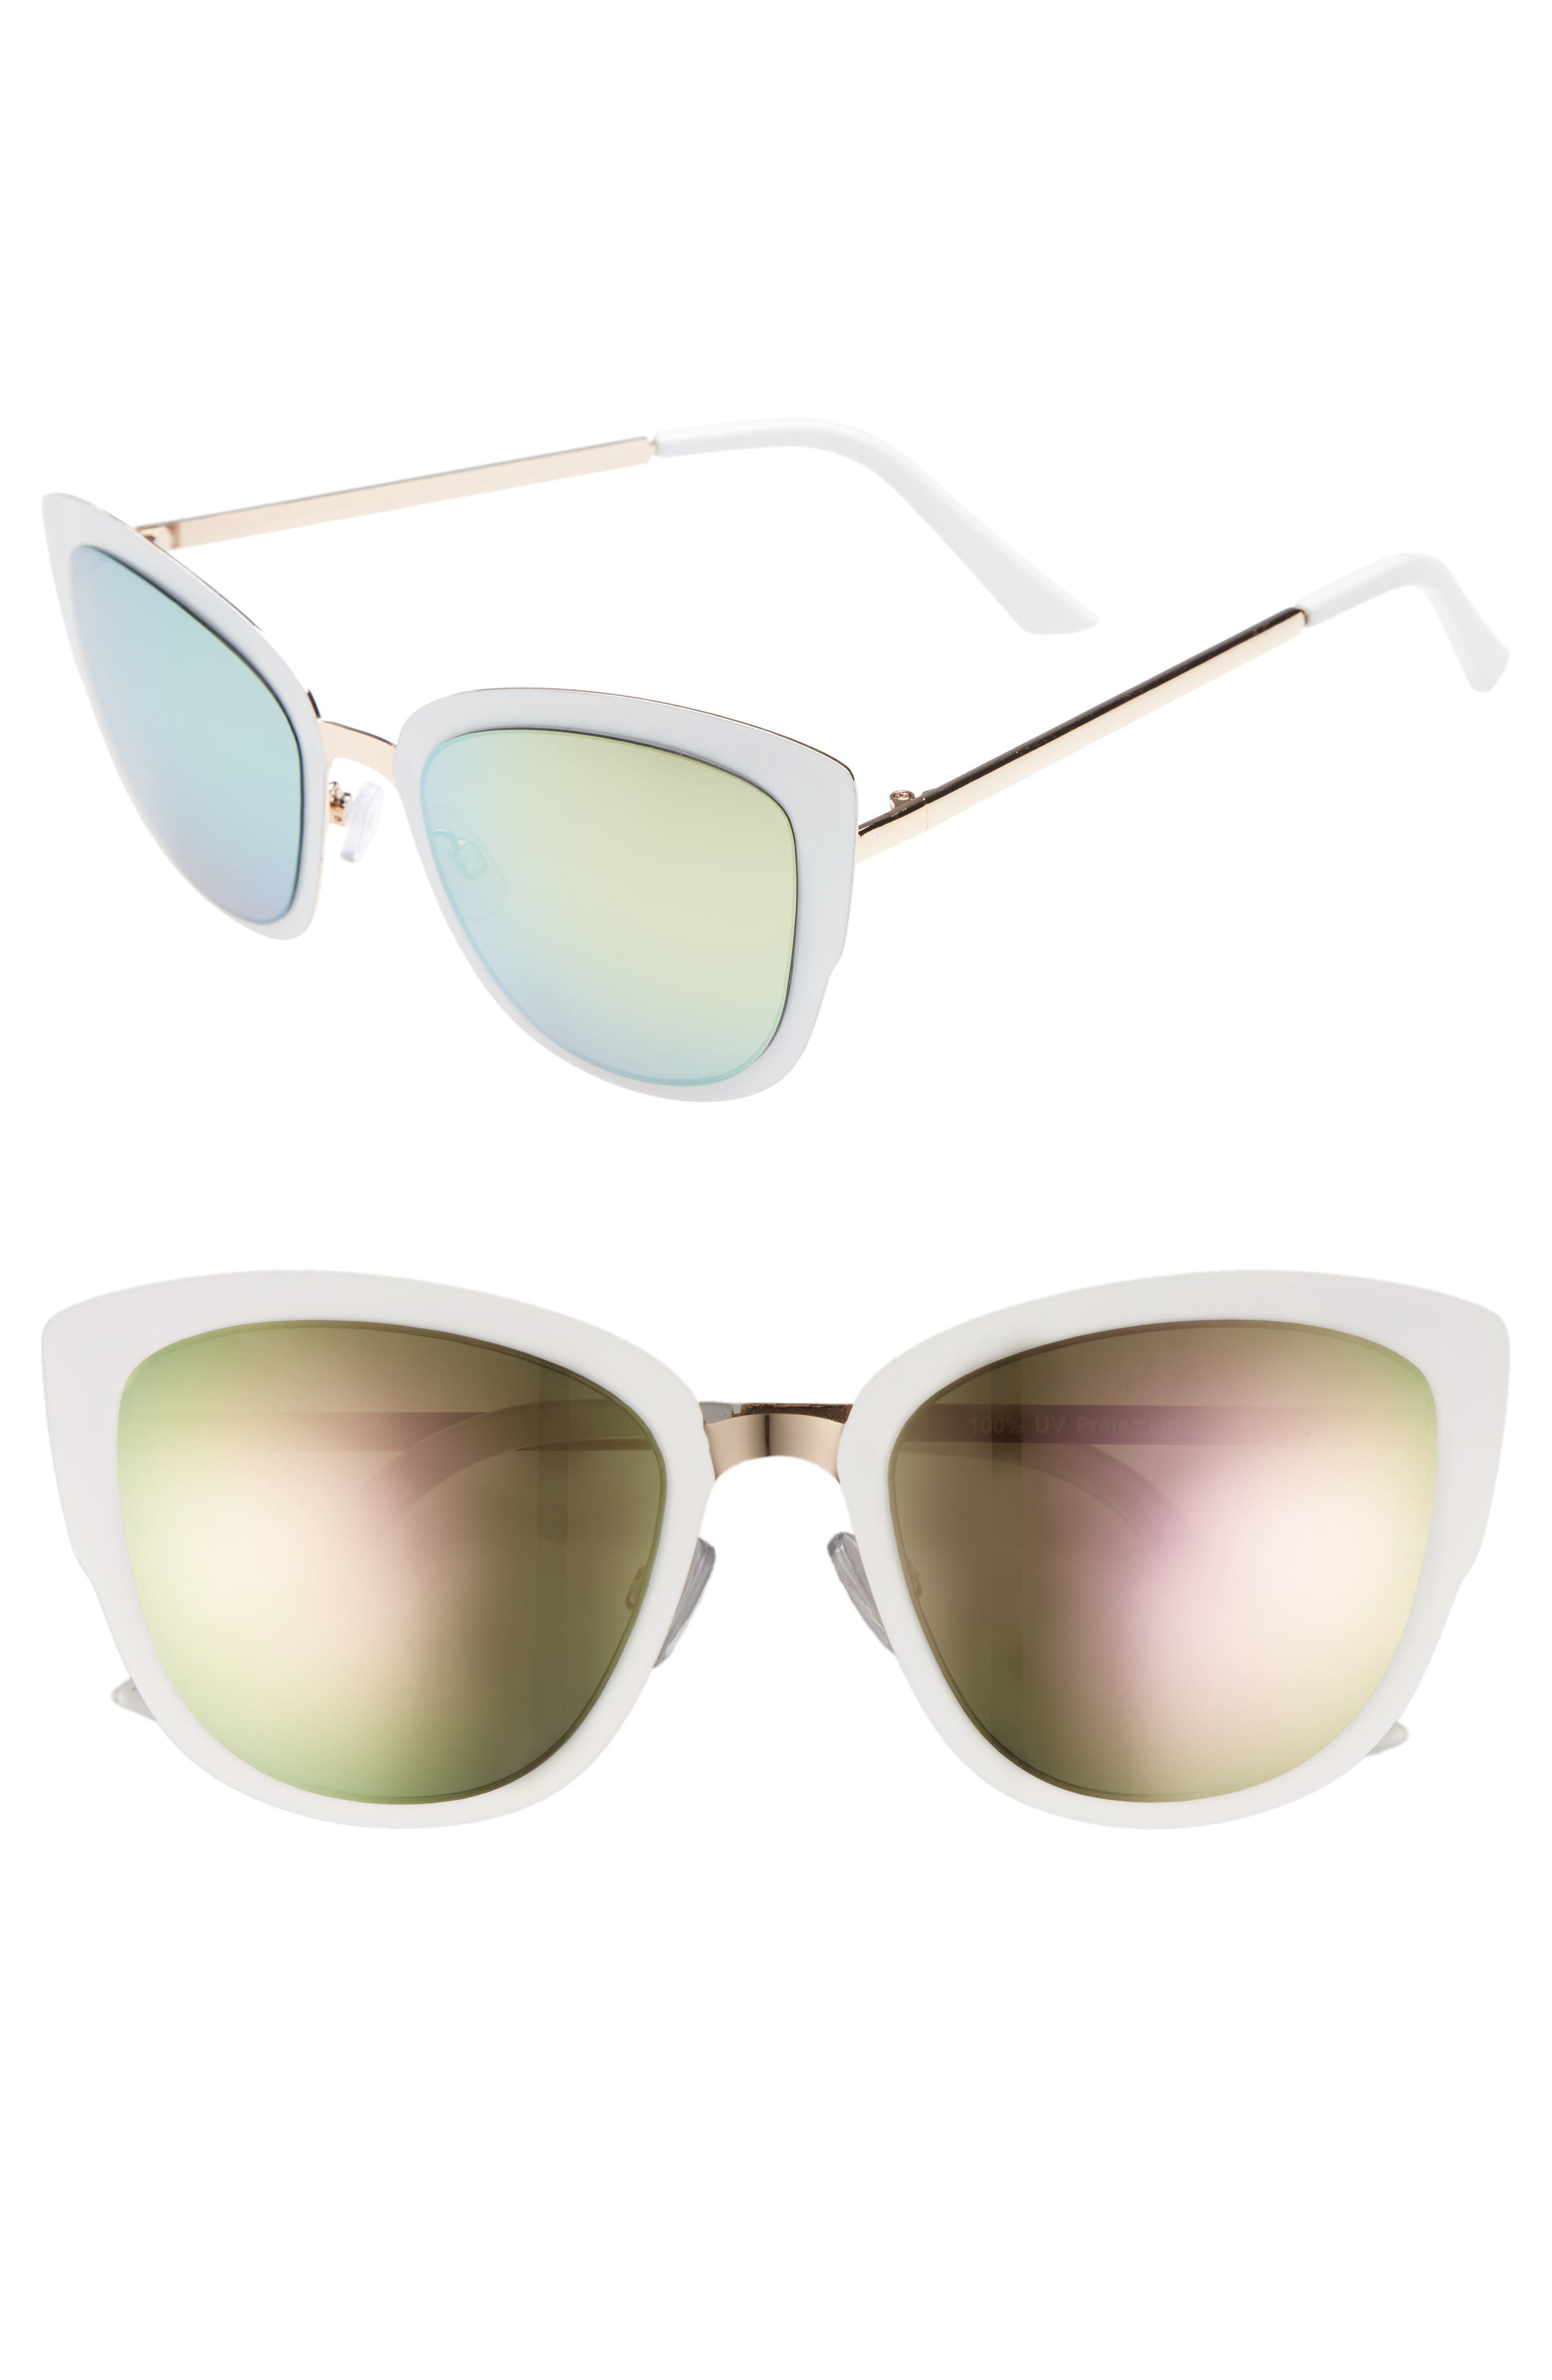 59mm Cat Eye Sunglasses,                             Main thumbnail 1, color,                             Gold/ White